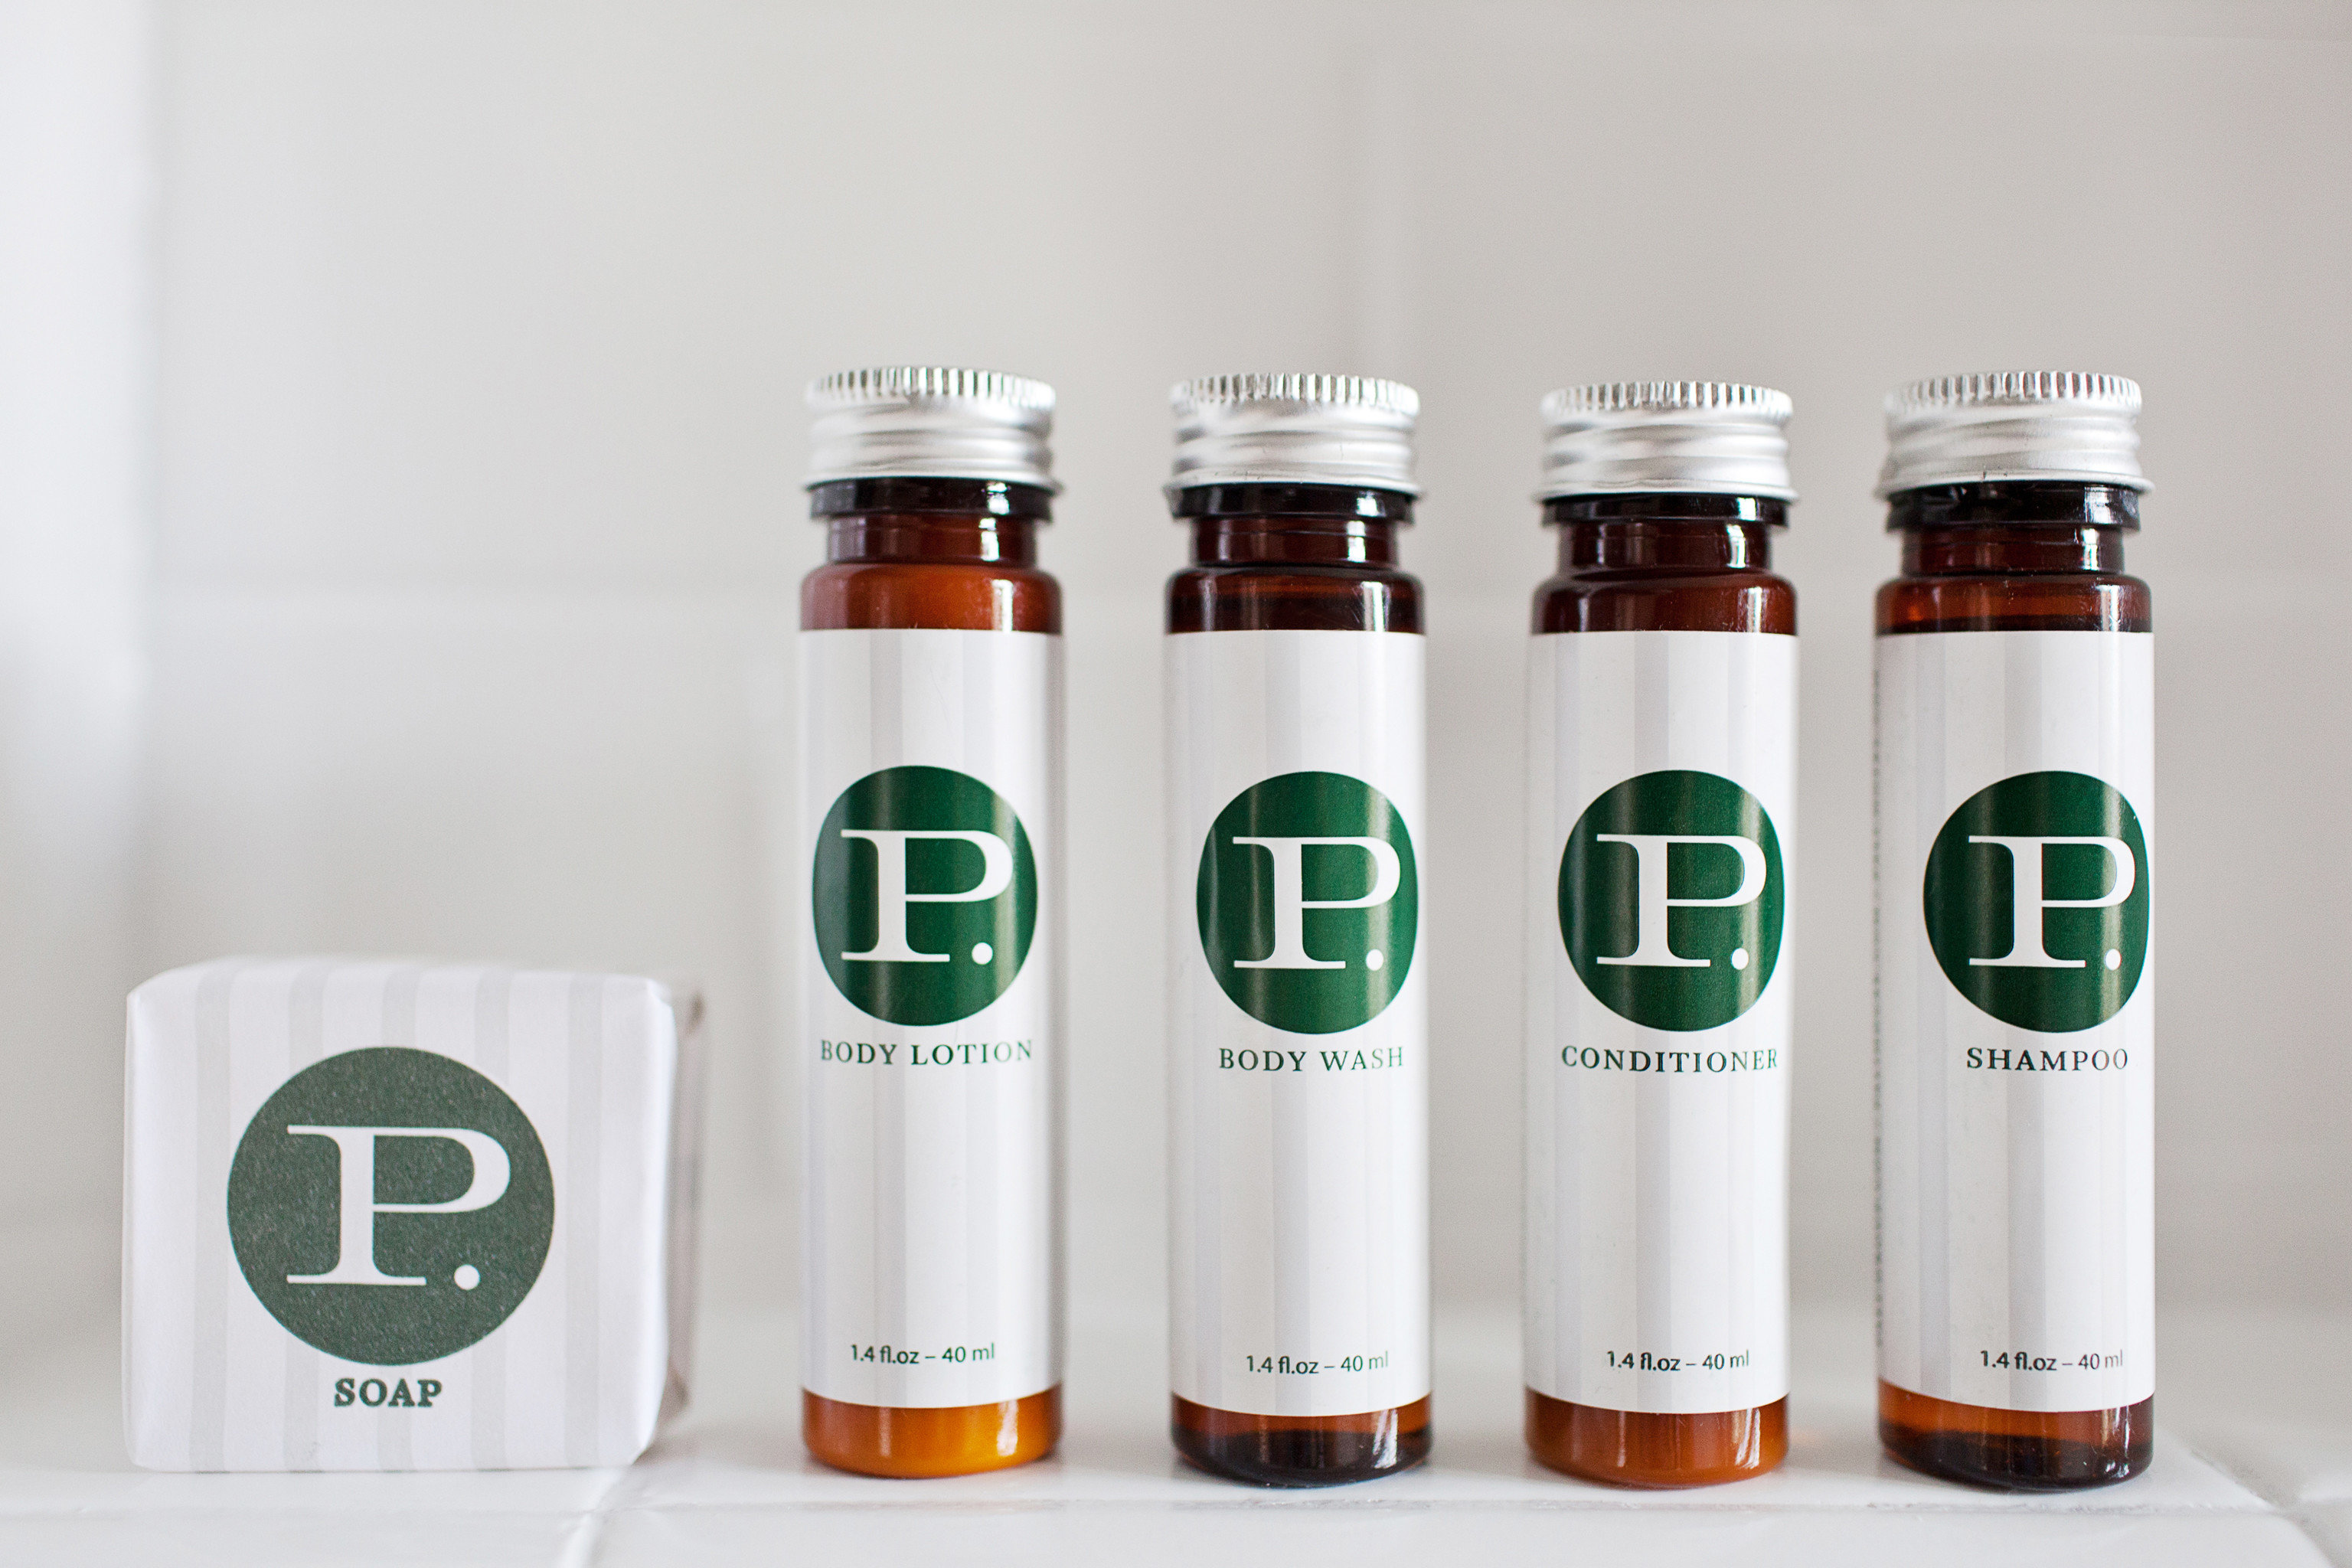 bottle beer bottle product drinkware Drink glass bottle counter brand tableware